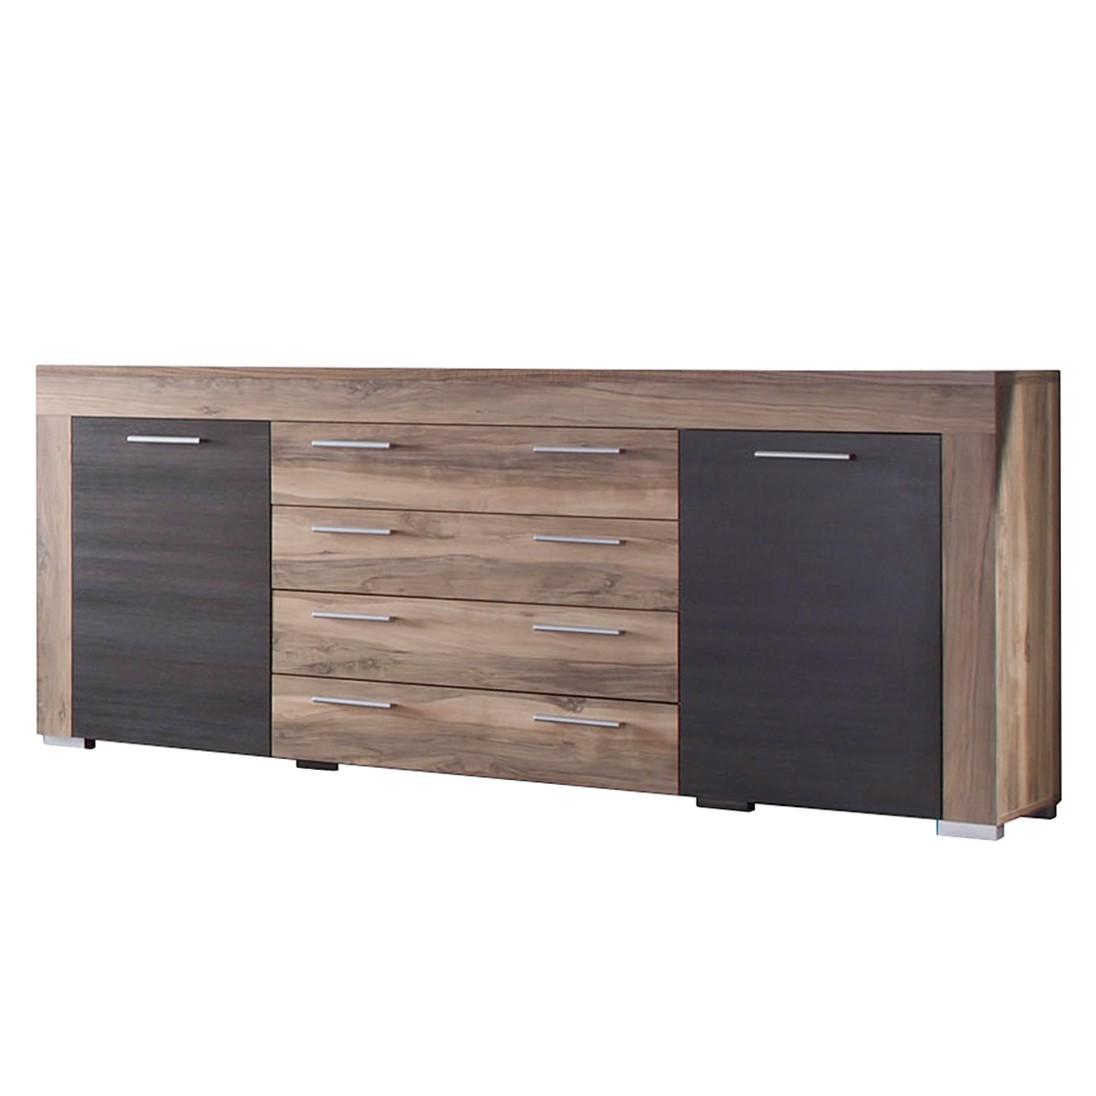 touchwood preis vergleich 2016. Black Bedroom Furniture Sets. Home Design Ideas